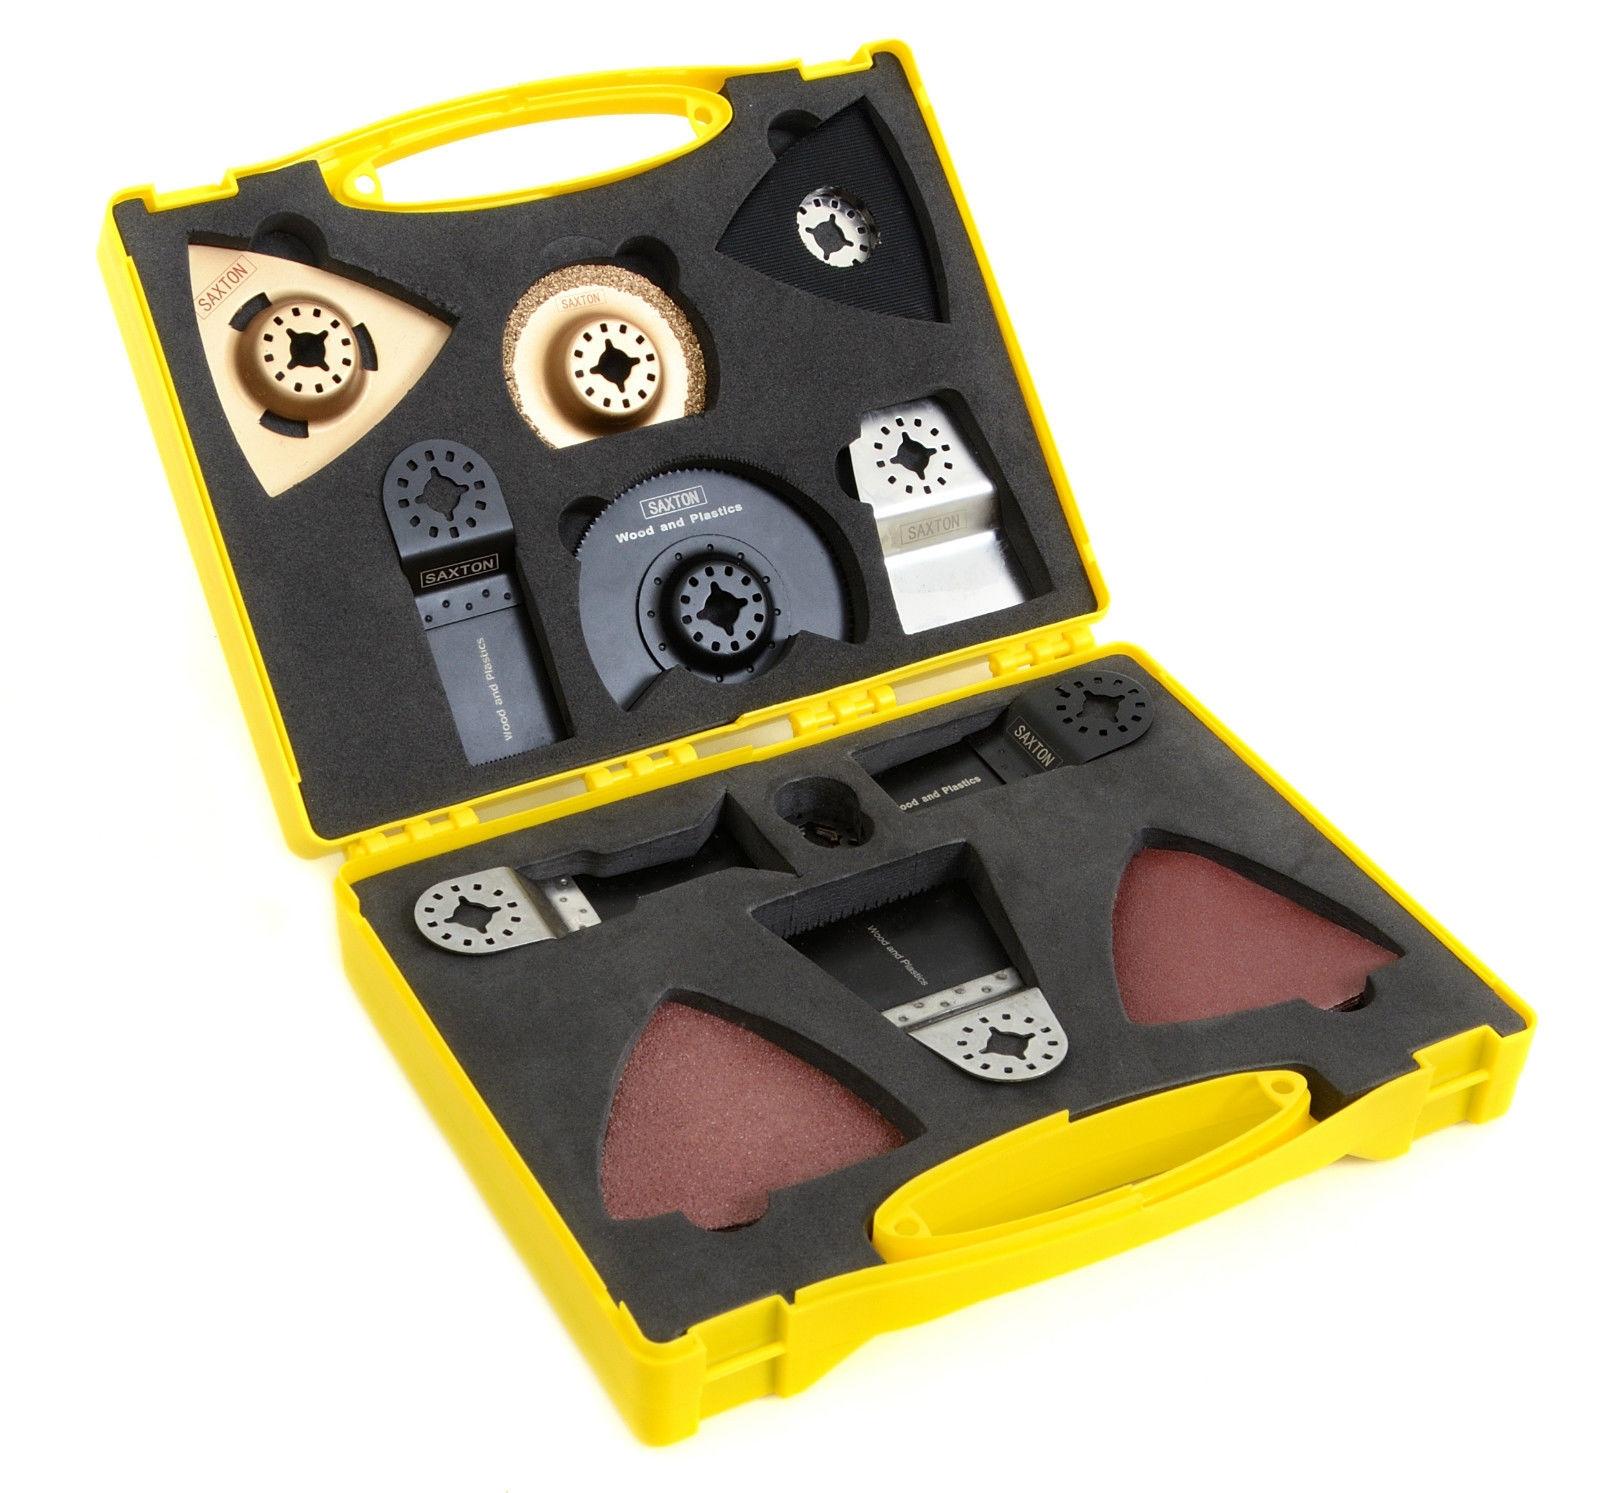 Bosch Oscillating Multitool 1x Saxton 65mm Wood Blade for Fein Multimaster